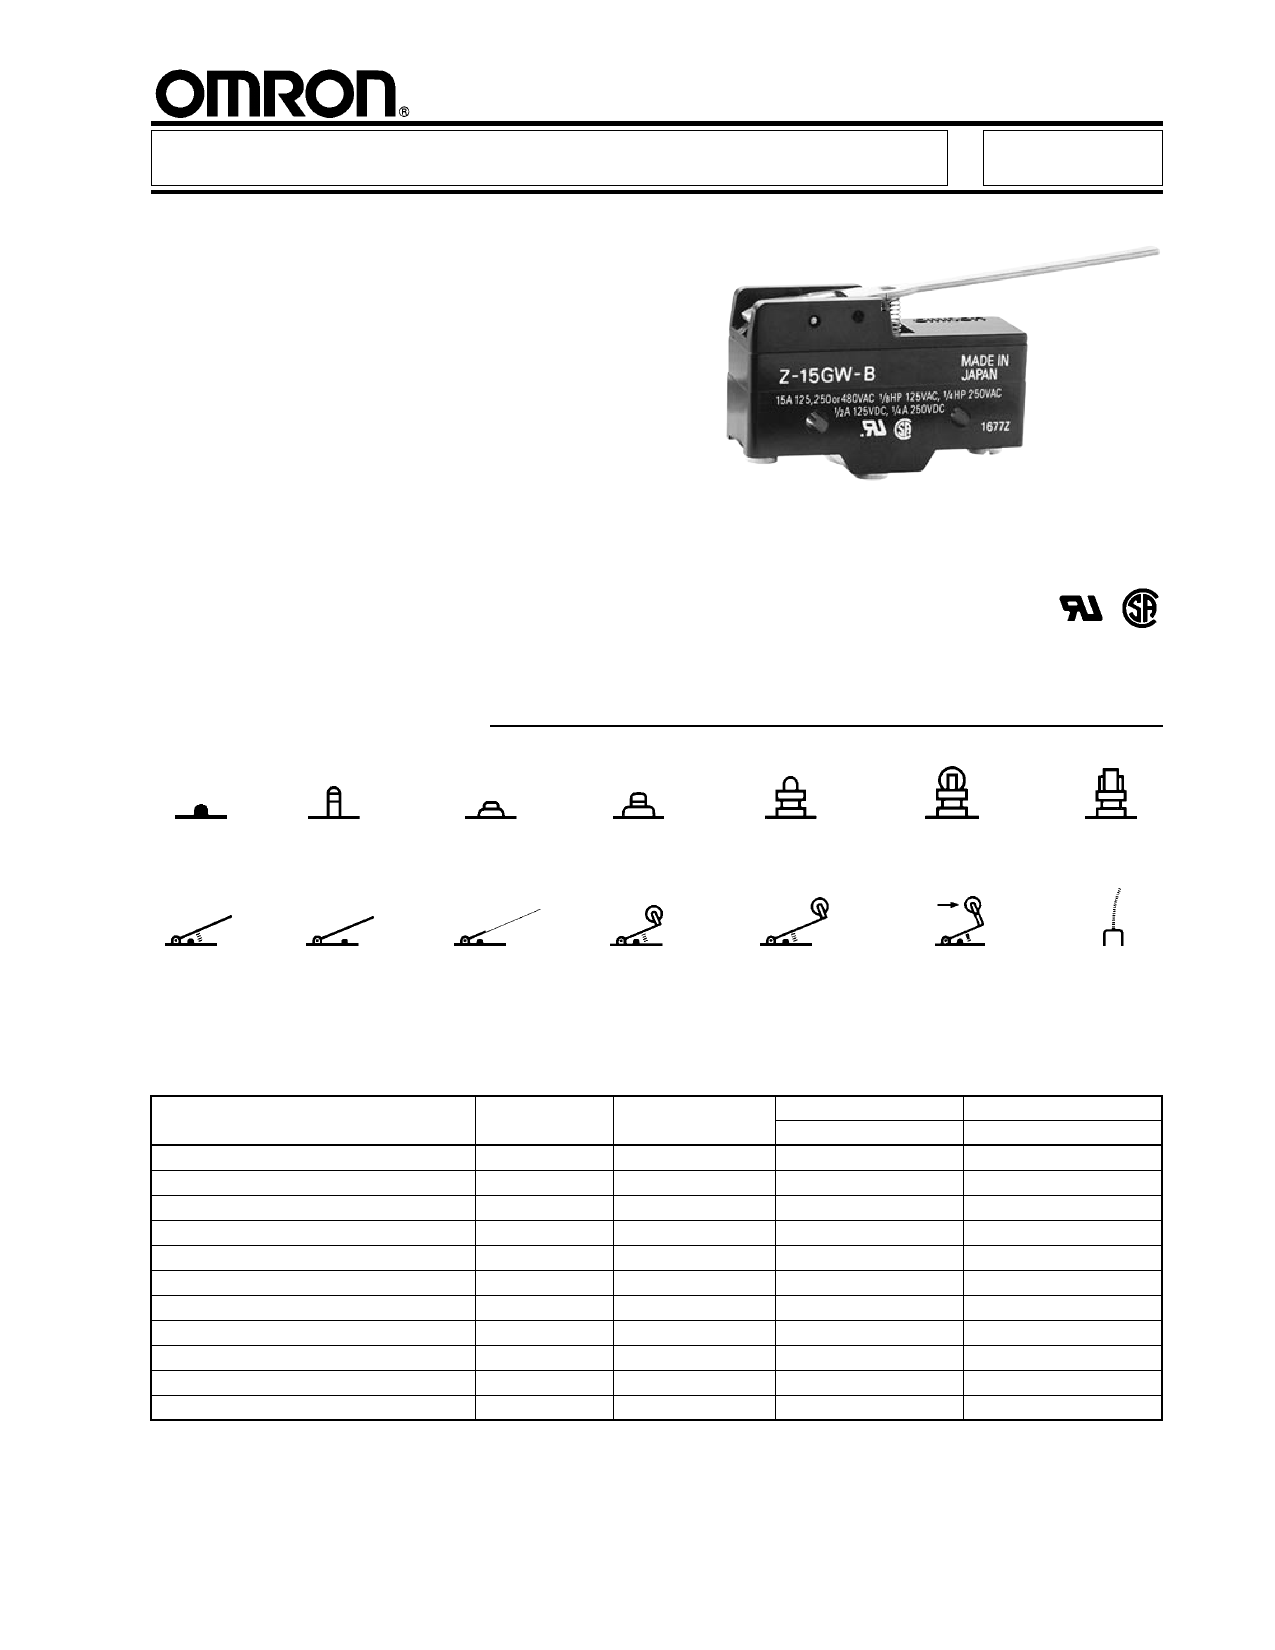 Z-15GW datasheet